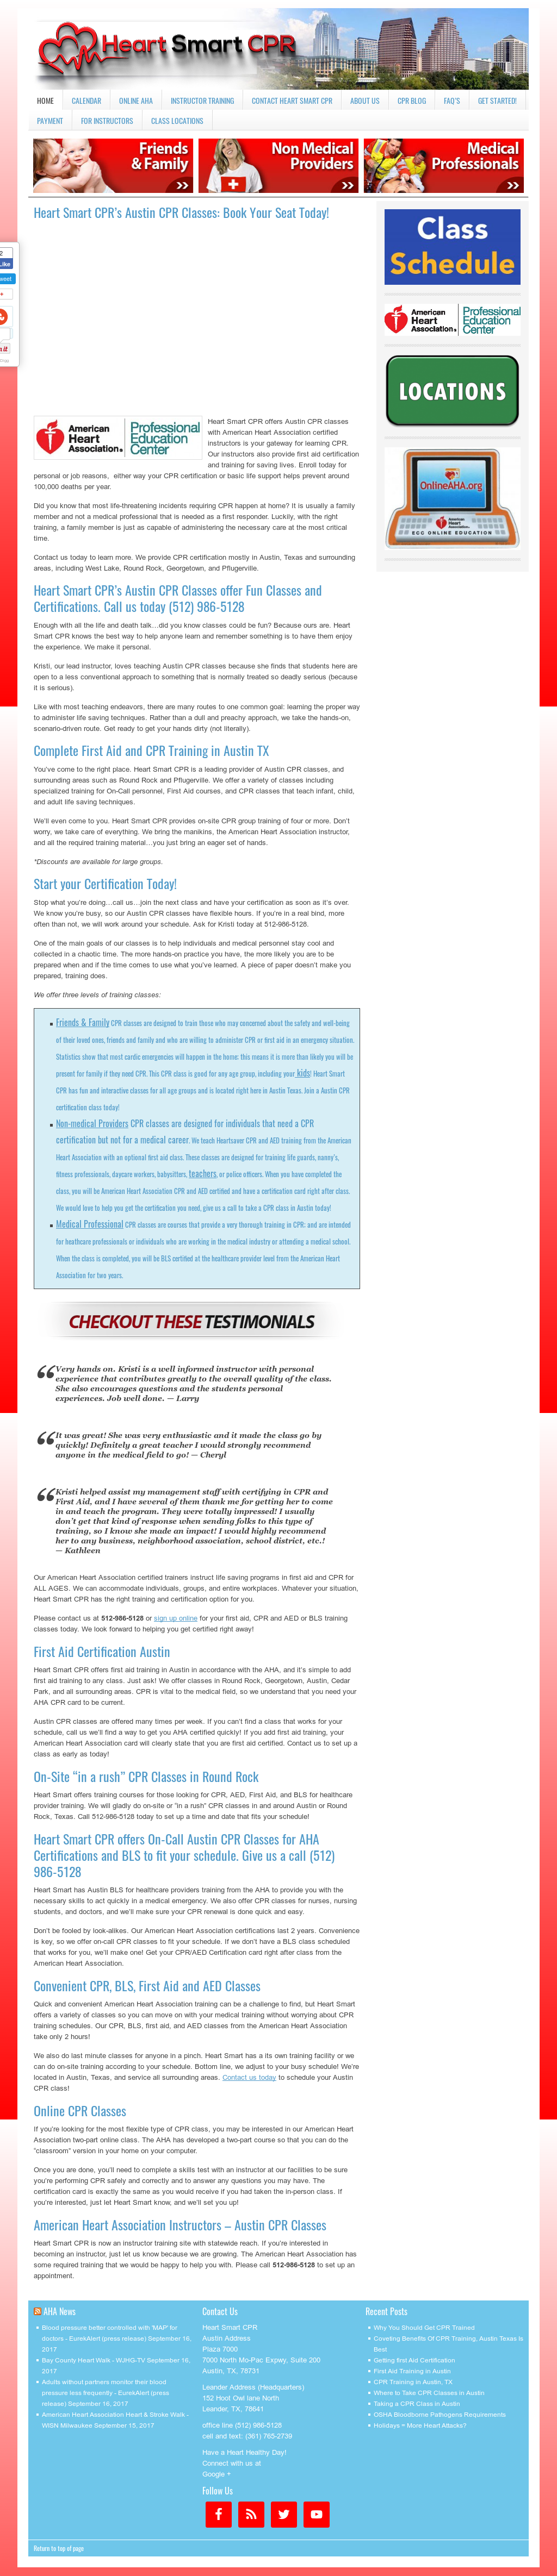 Hermosa Austin Cpr Certification Coleccin De Imgenes Cmo